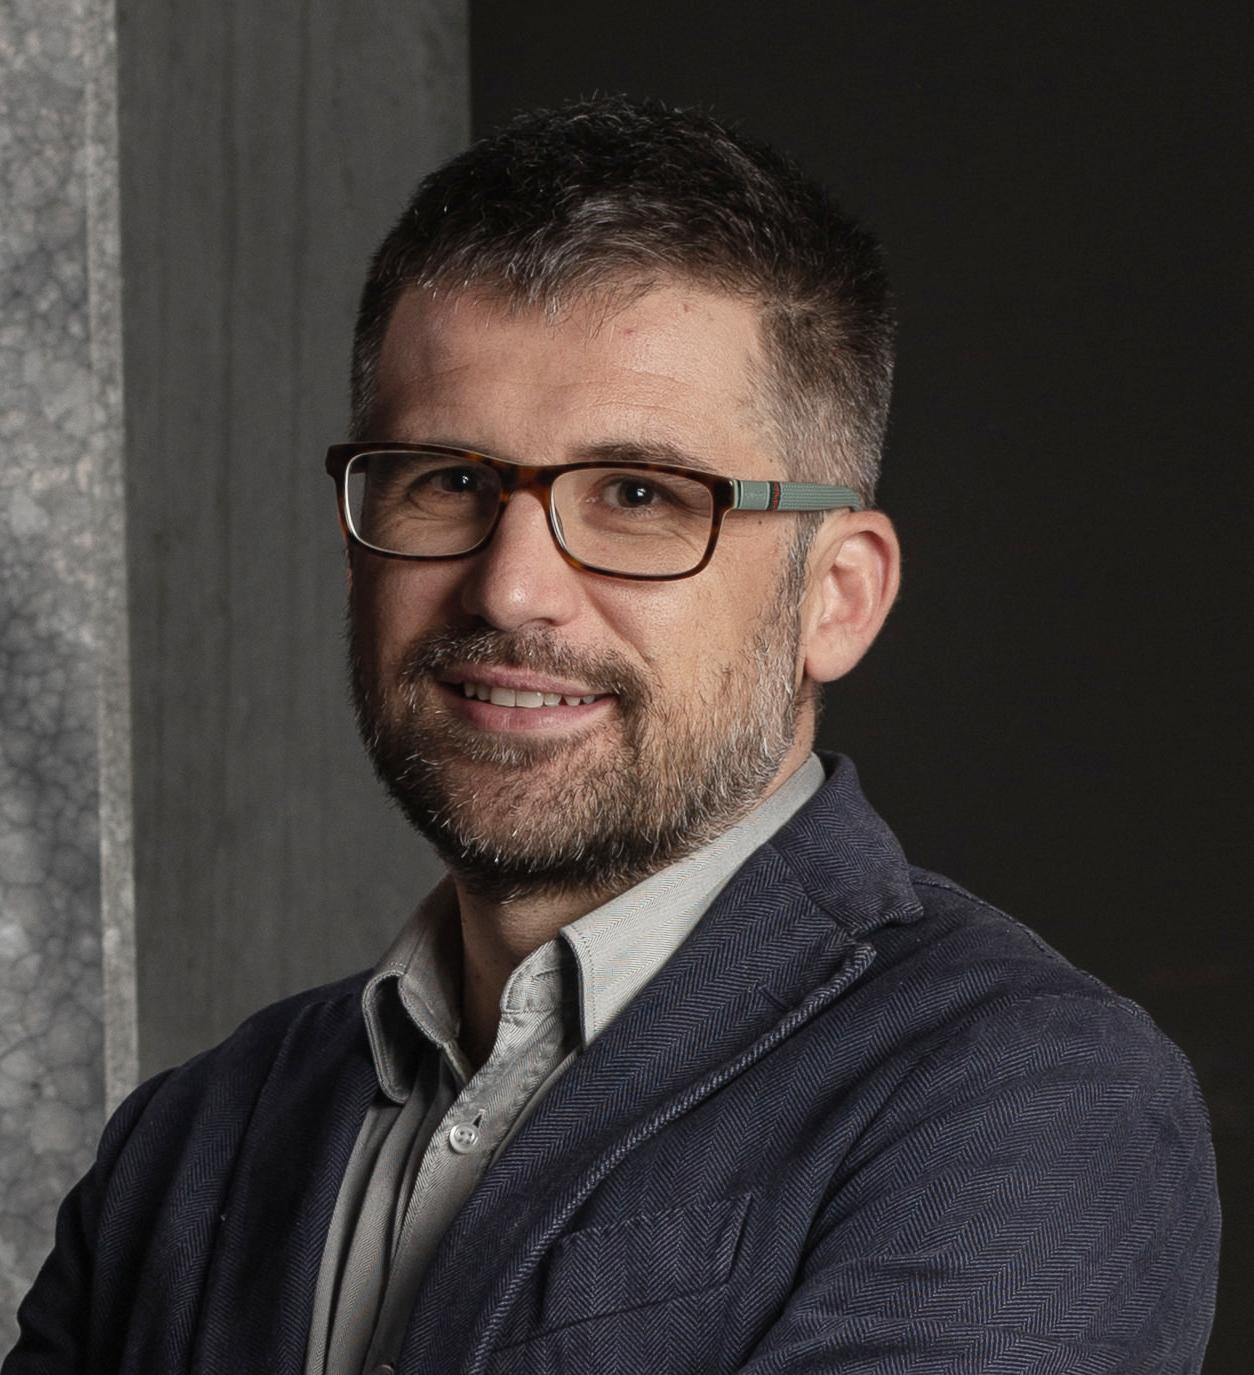 Ing. Baldracchi Paolo